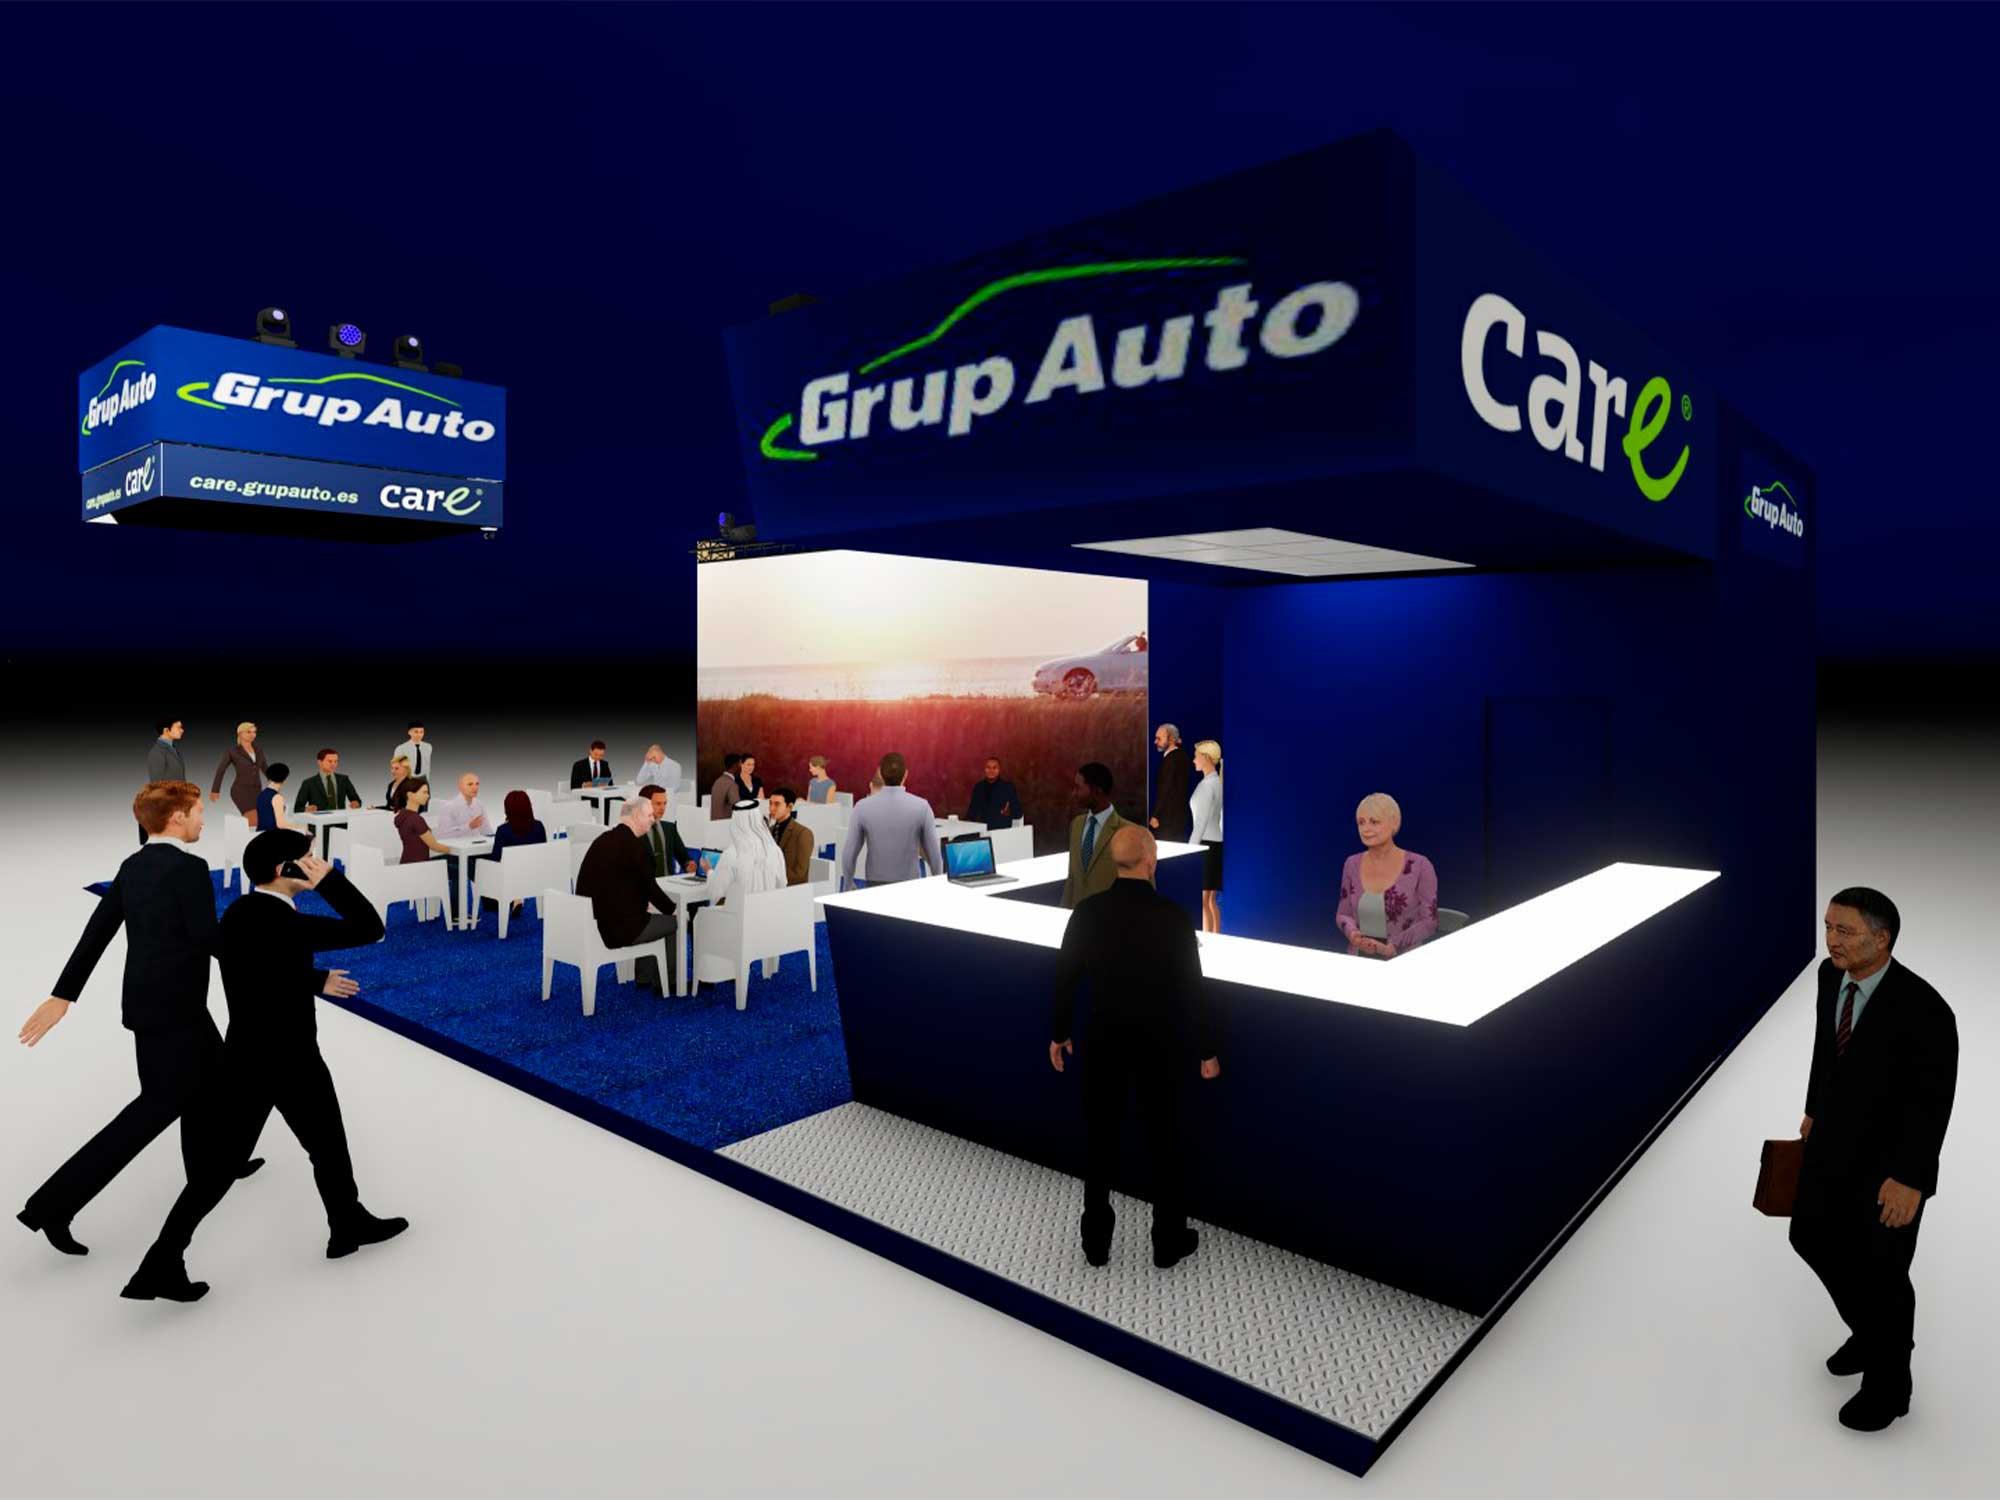 Stand Motortech Grupauto